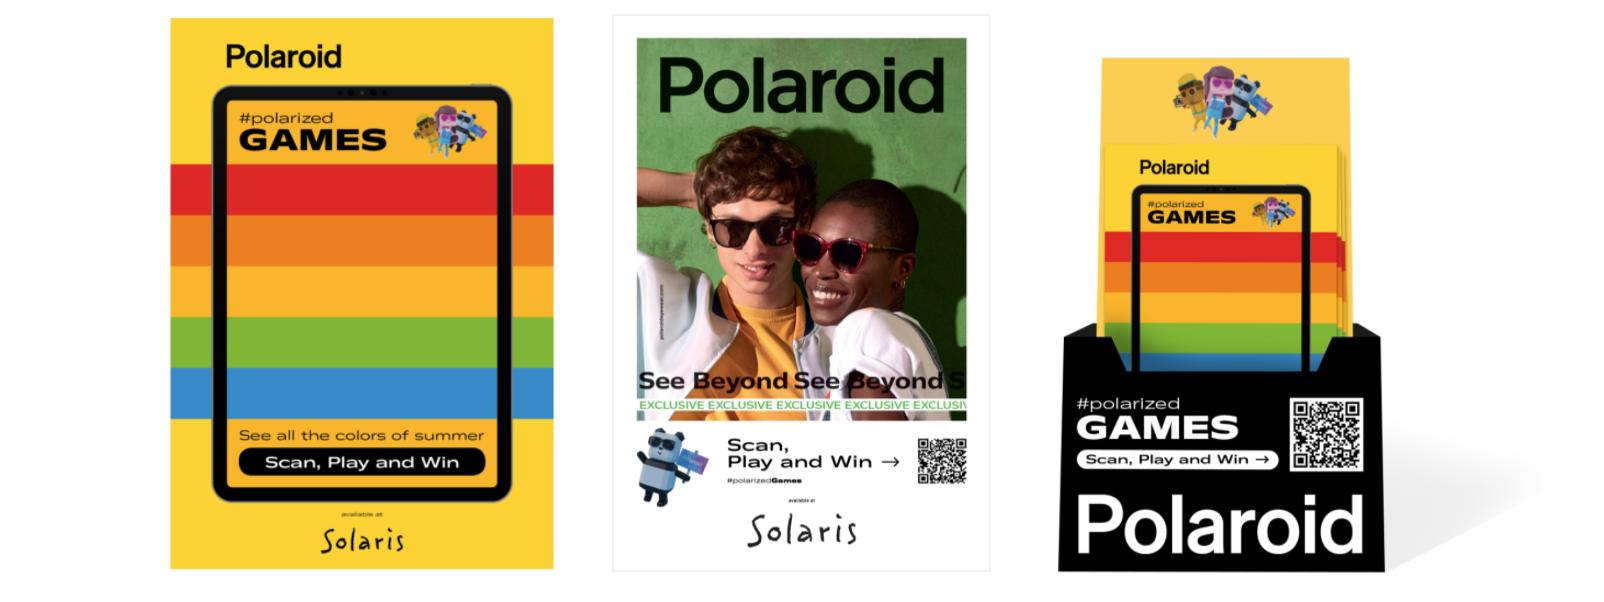 Polaroid Eyewear brand identity